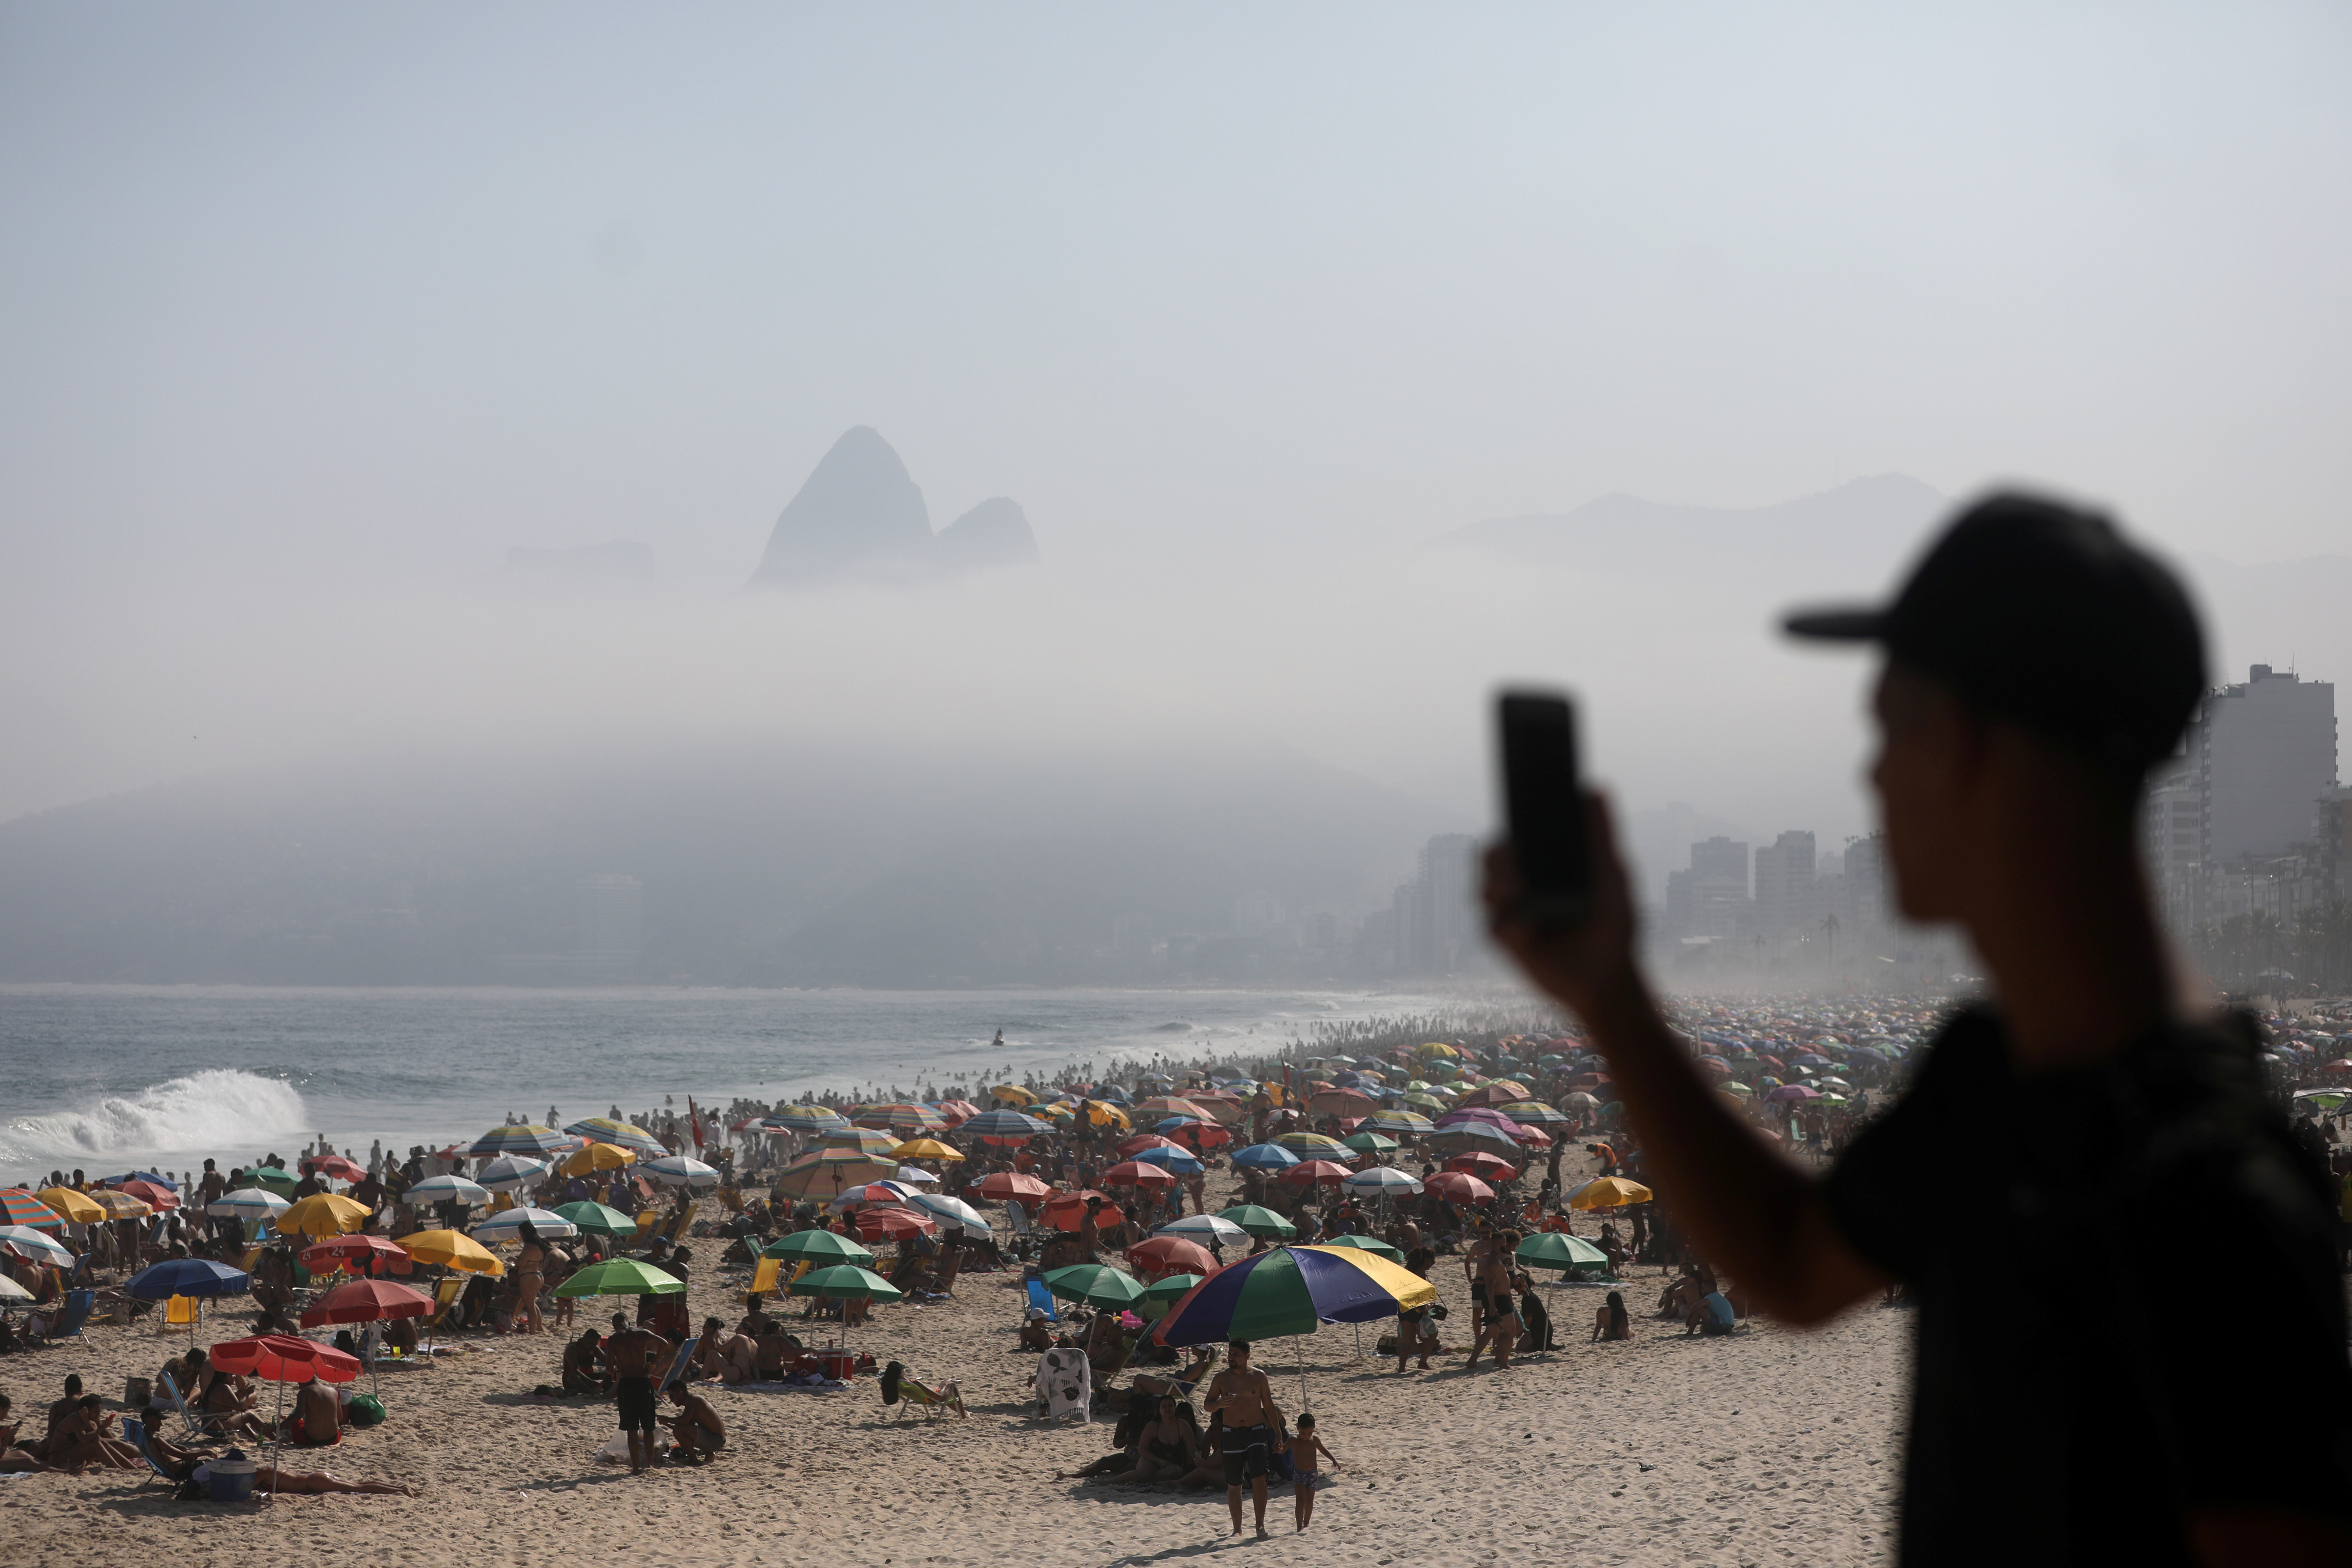 A man uses his phone as people enjoy at Ipanema beach, amid the coronavirus disease (COVID-19) outbreak, in Rio de Janeiro, Brazil September 6, 2020. REUTERS/Pilar Olivares